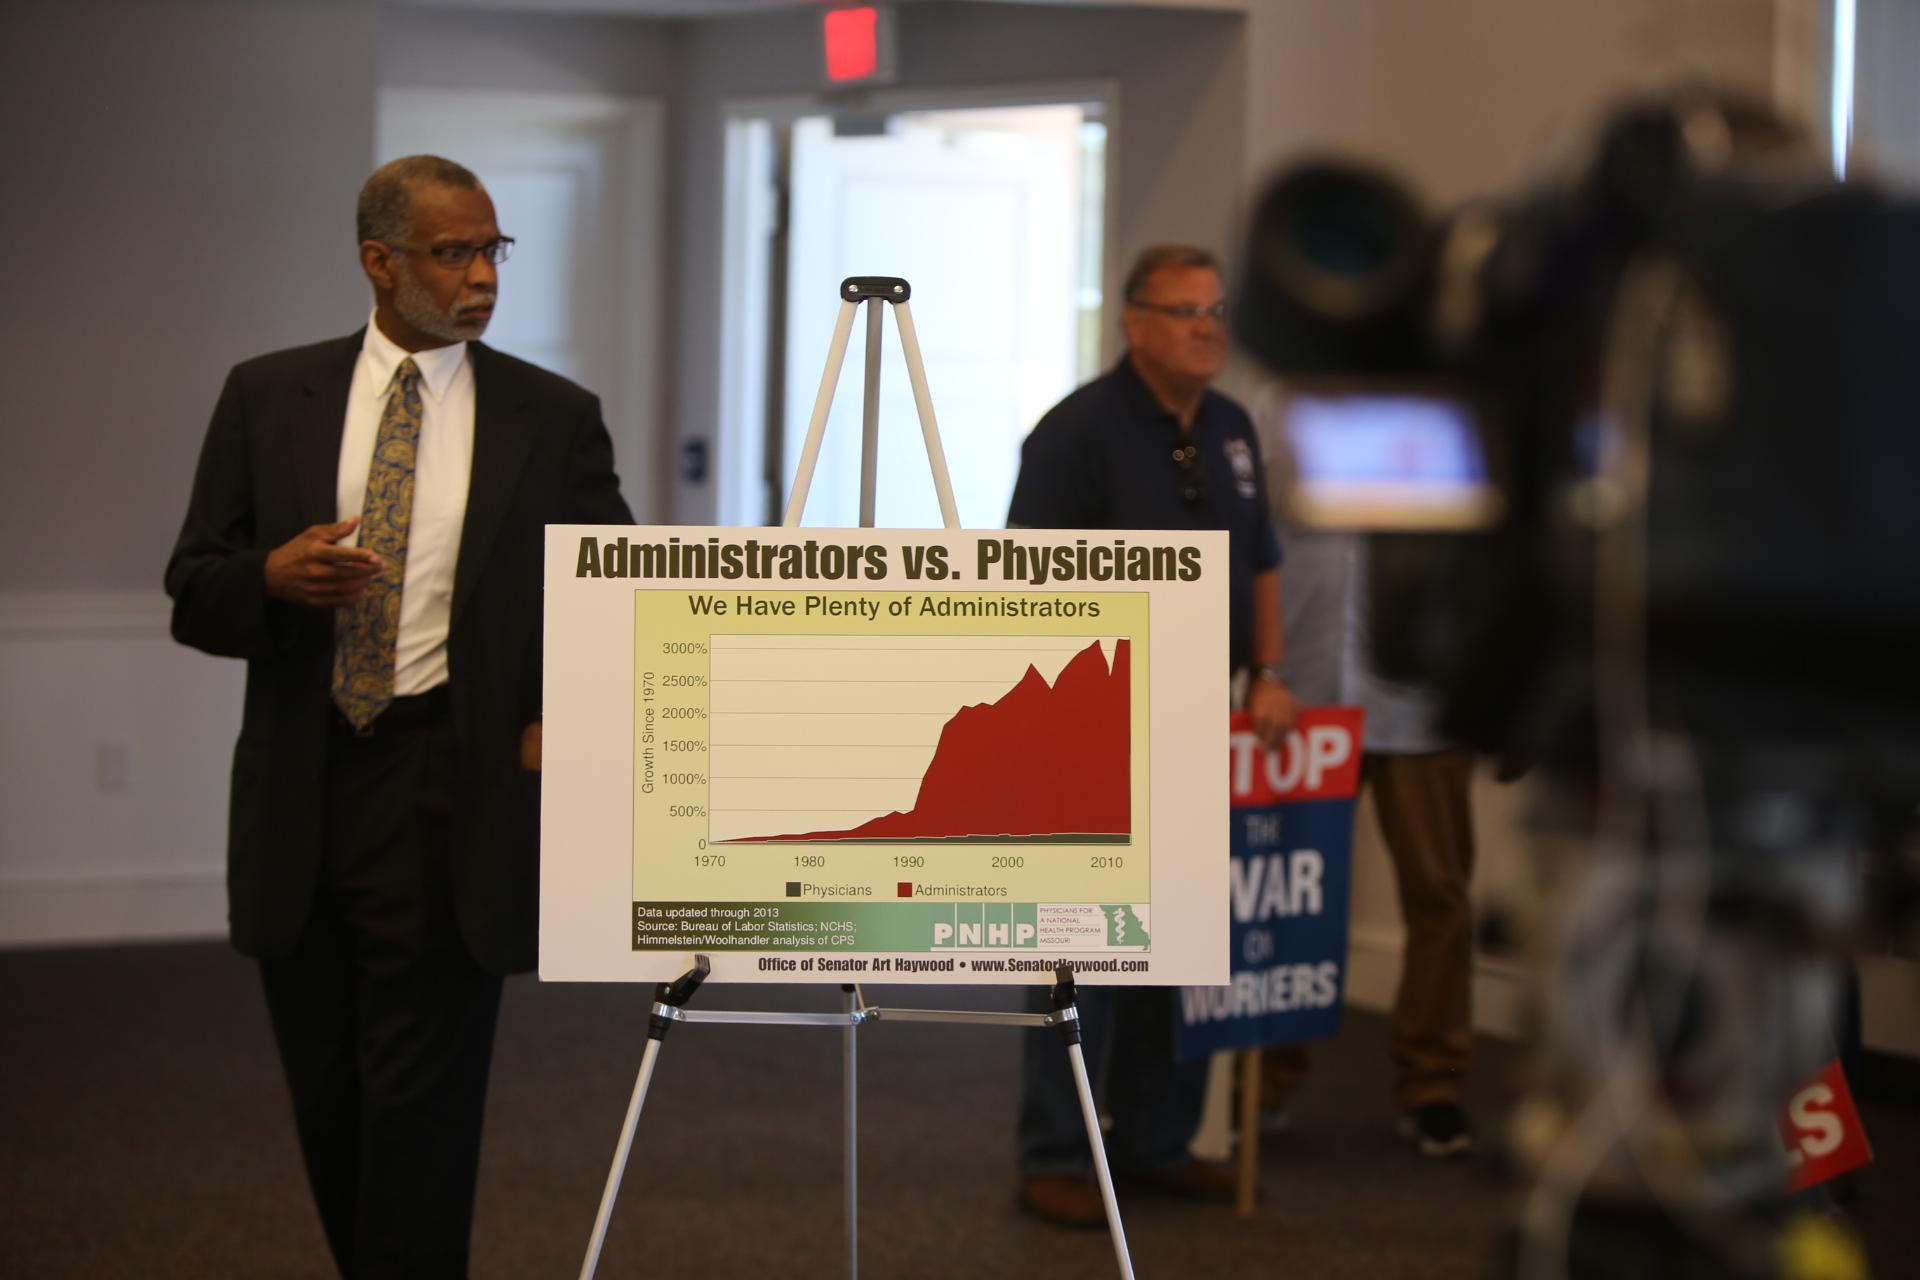 Senator Art Haywood Announces Plans to Introduce Single-Payer Healthcare Legislation in Pennsylvania State Senate